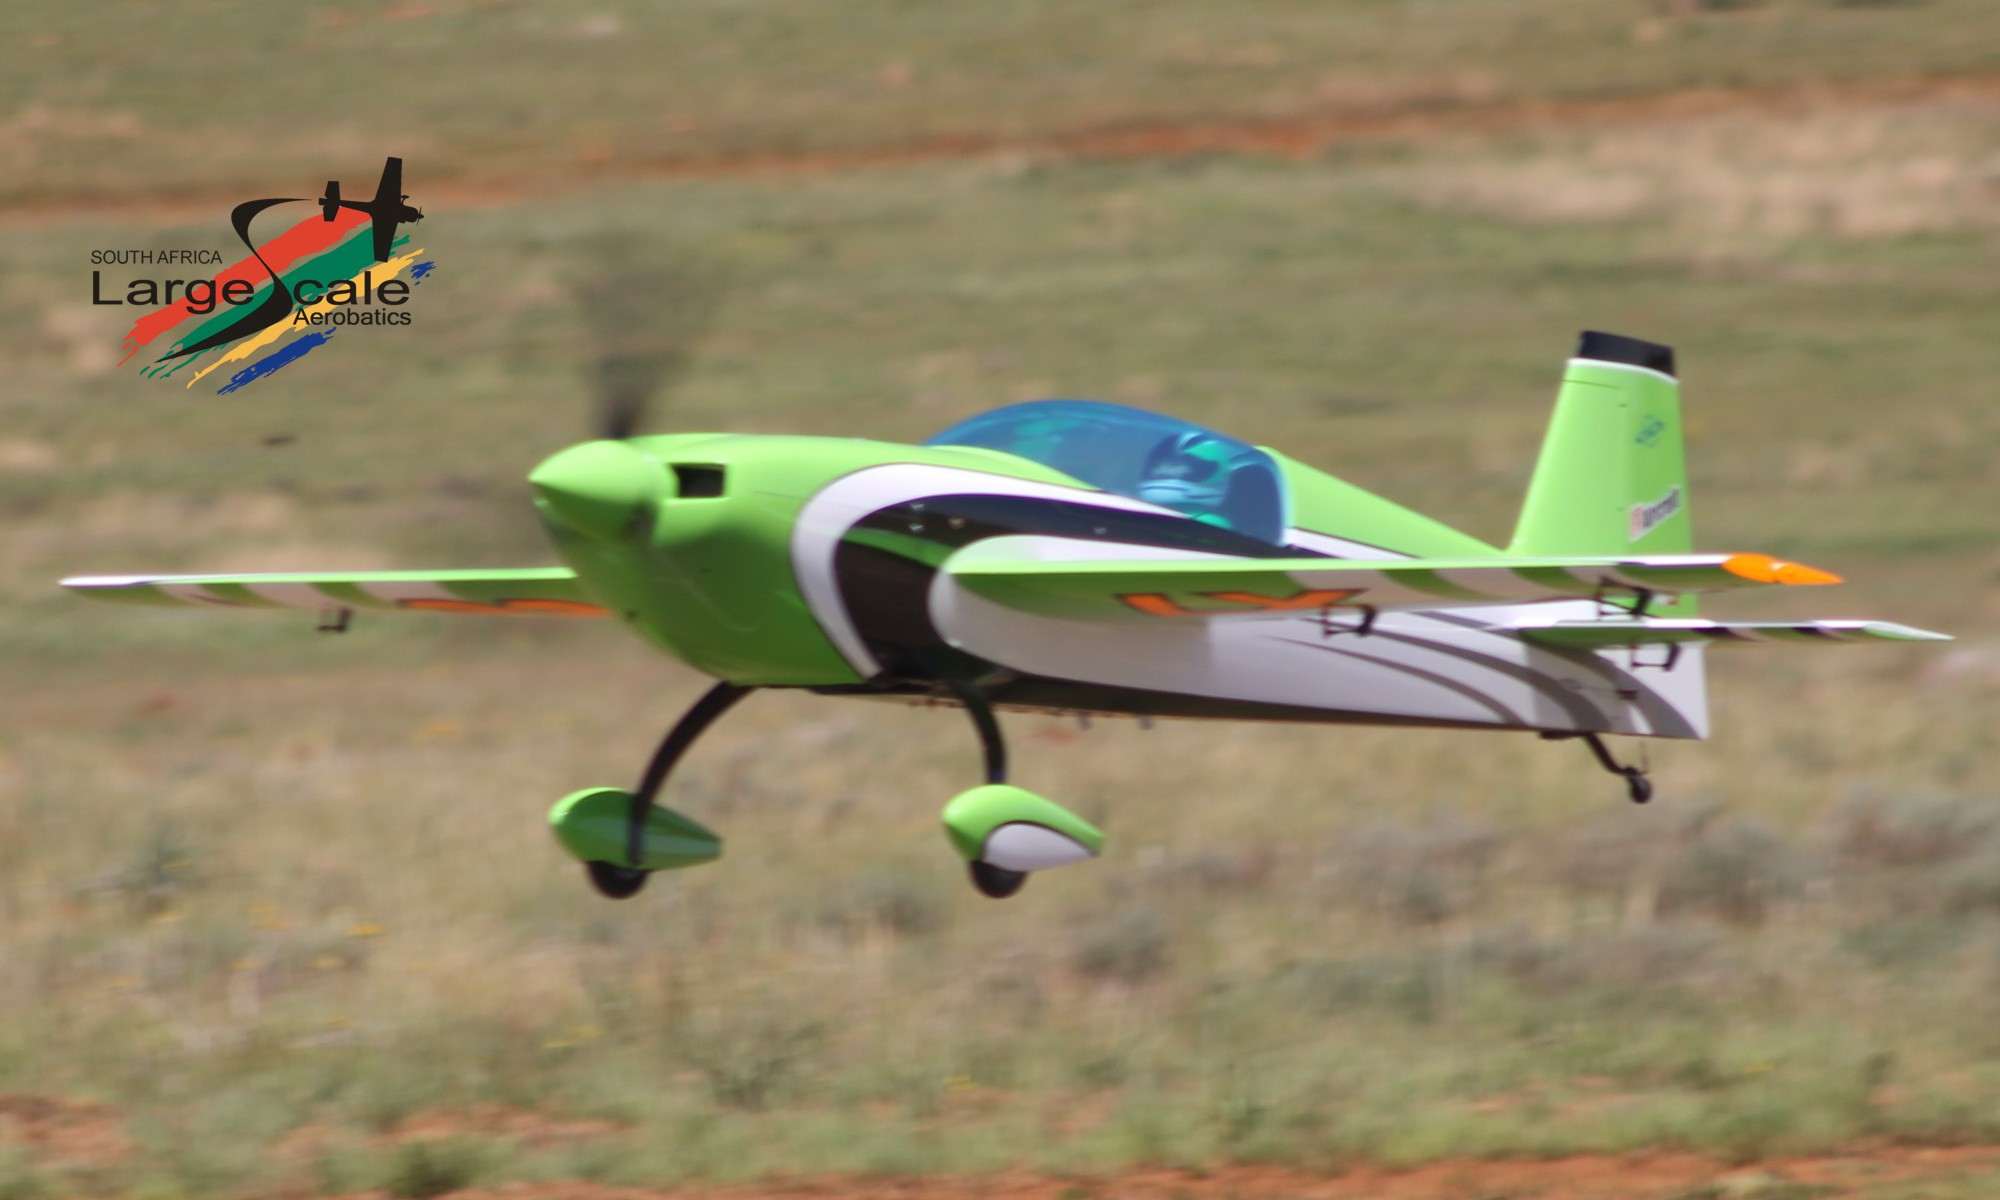 Large Scale Aerobatics South Africa